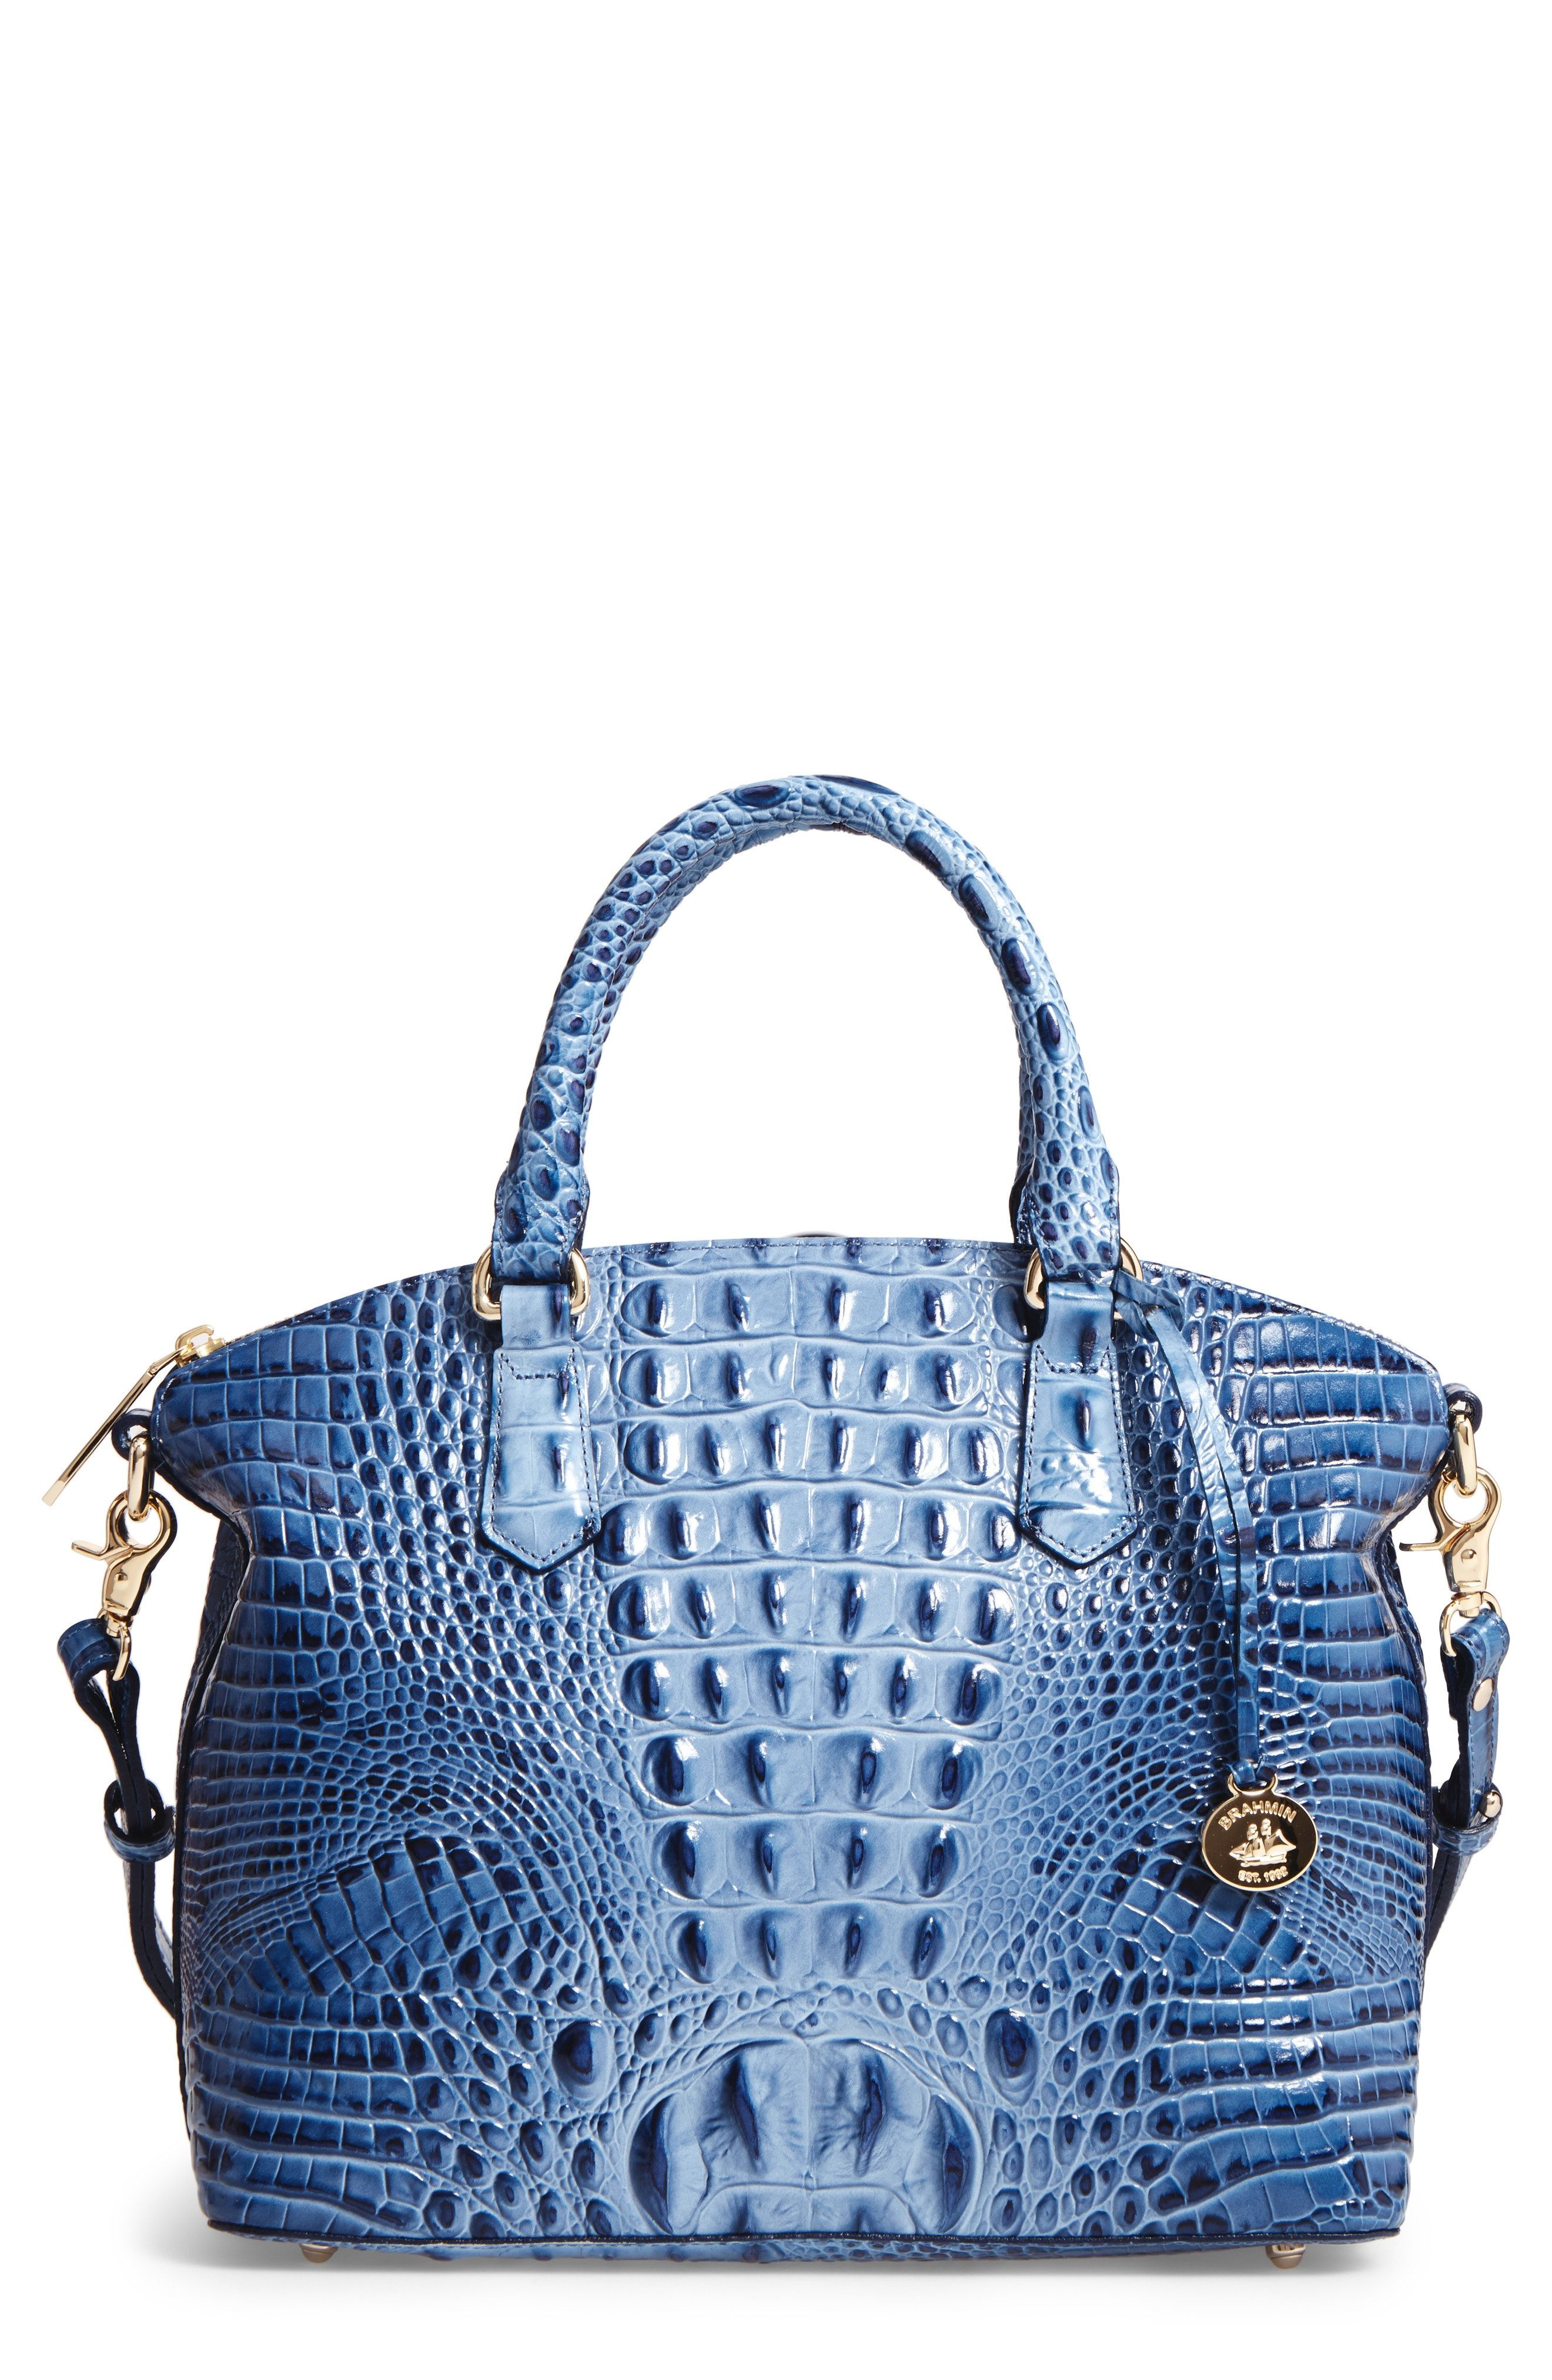 fb867e9fe2 New Brahmin Medium Duxbury Croc Embossed Leather Satchel fashion online.    275   shop.seehandbags